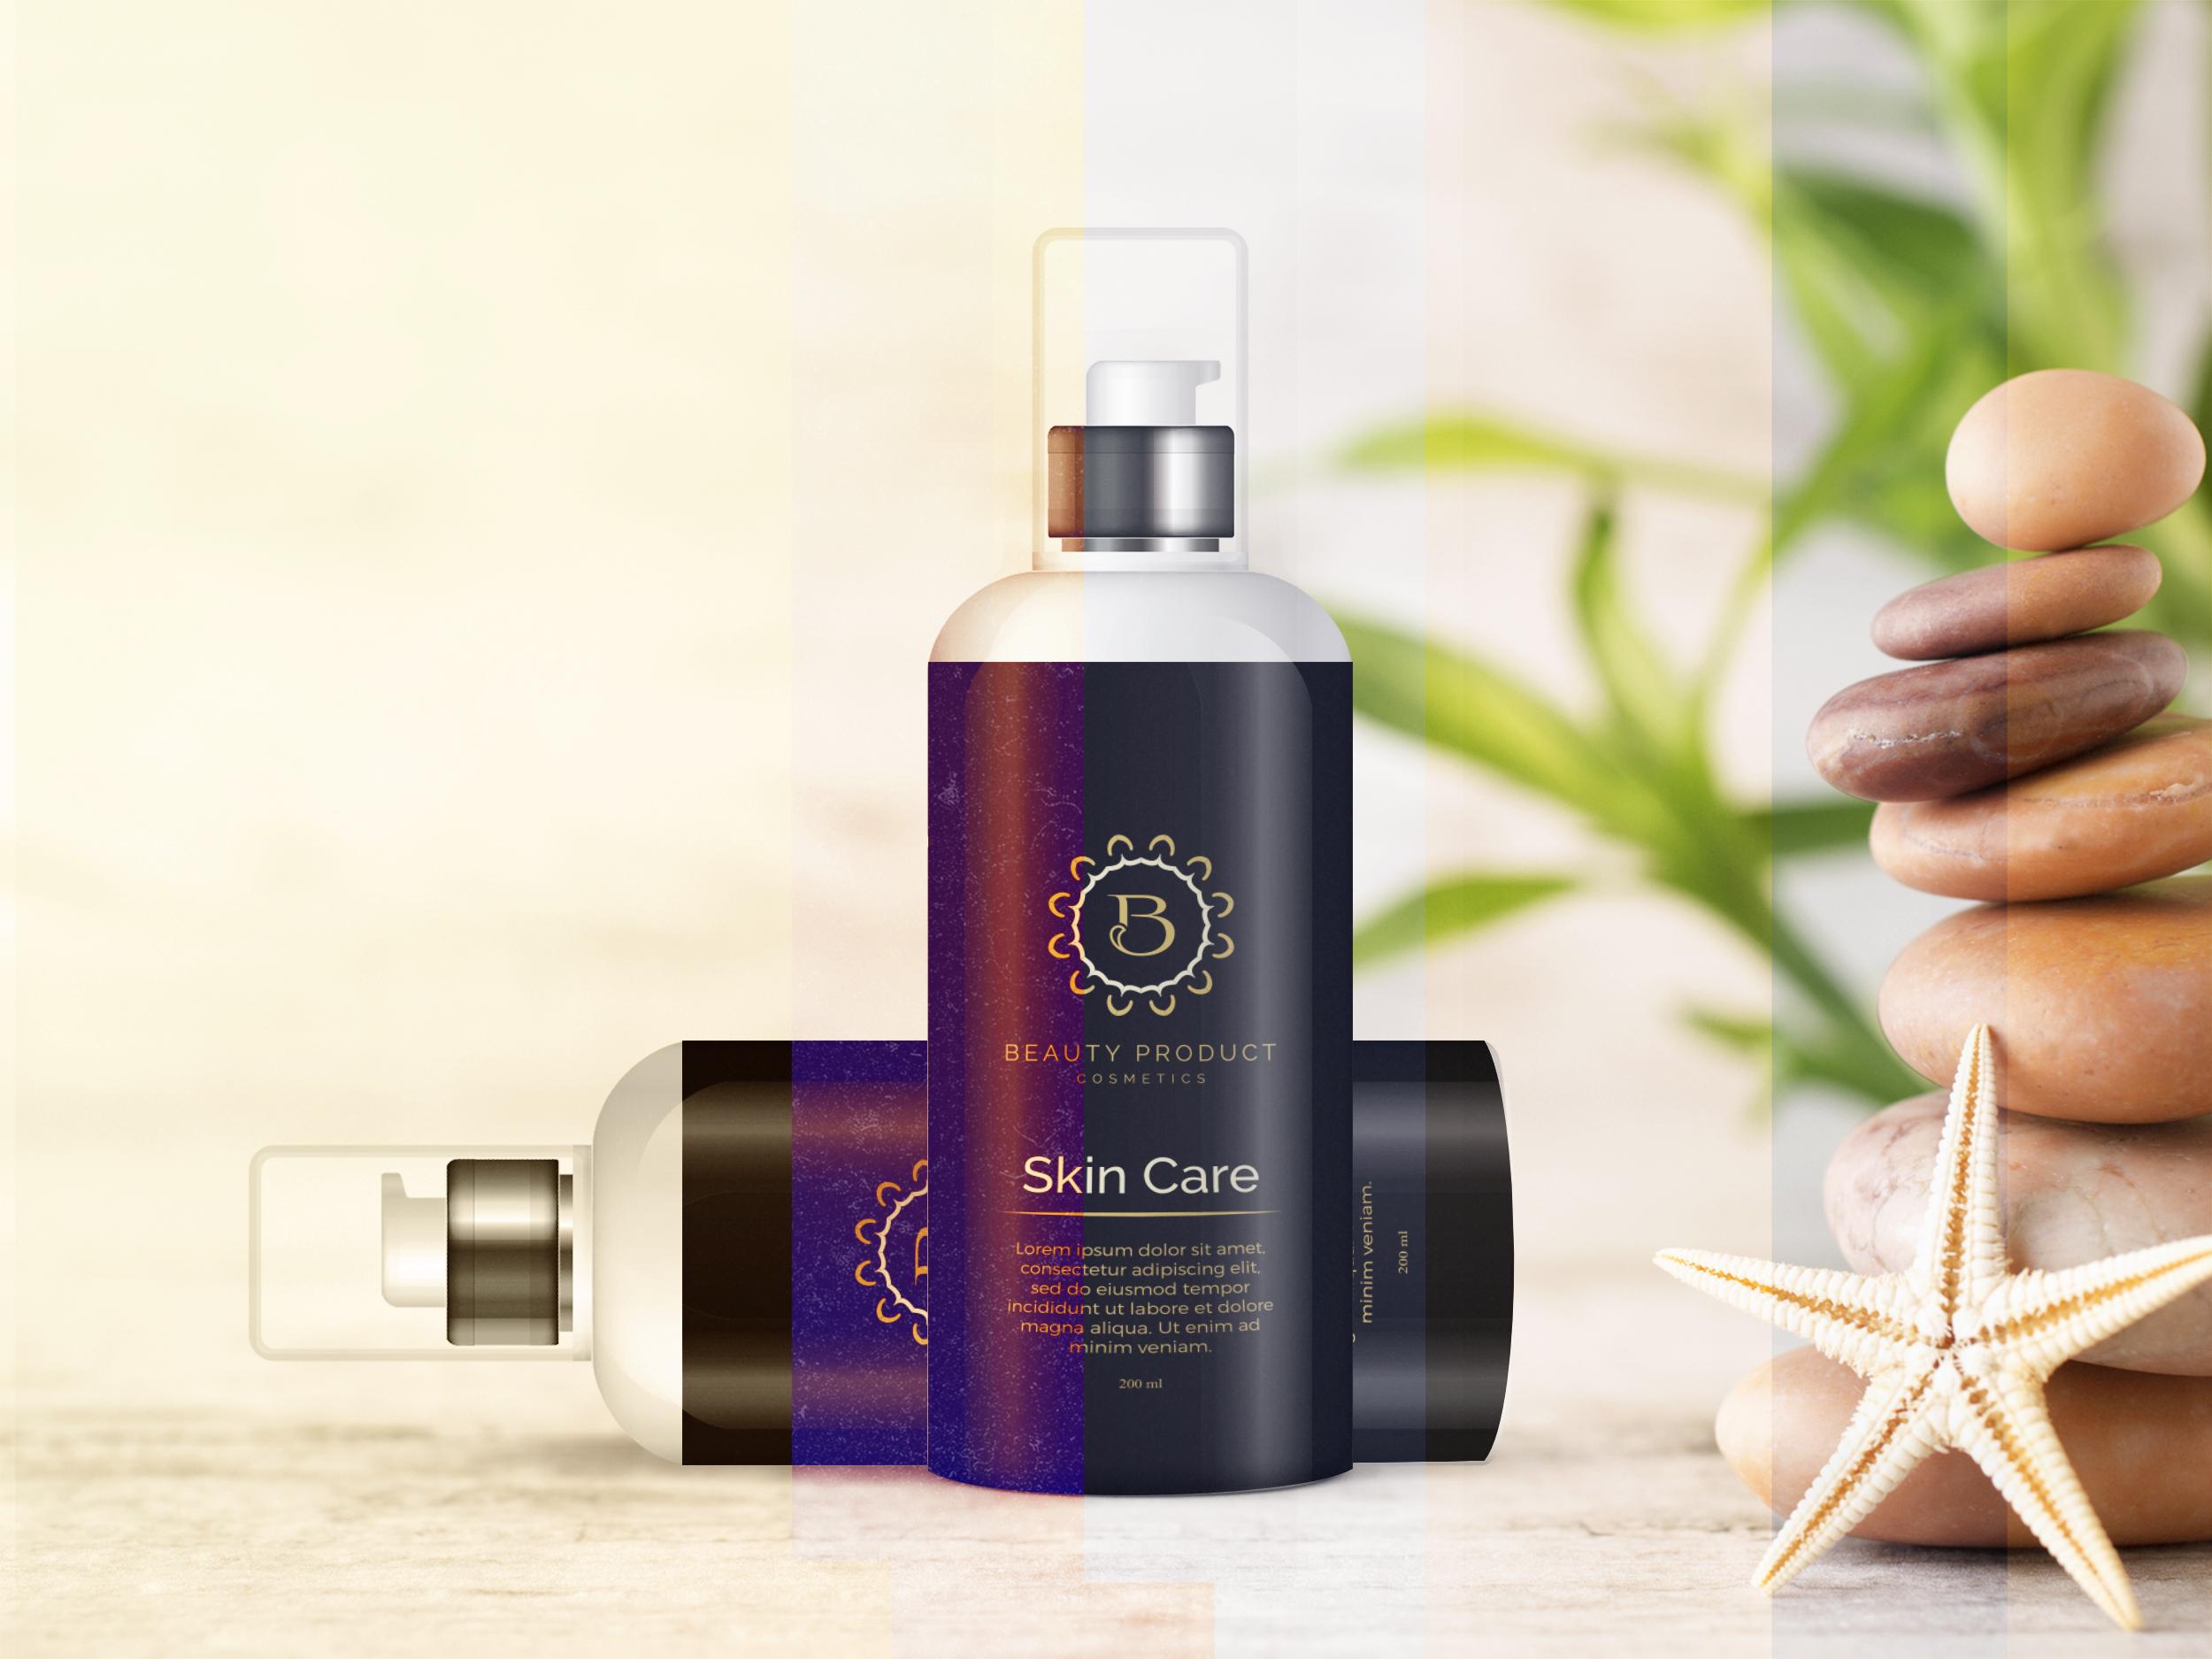 Cosmetic Bottle Mockup, Shampoo and Oil Bottle mock up example image 1